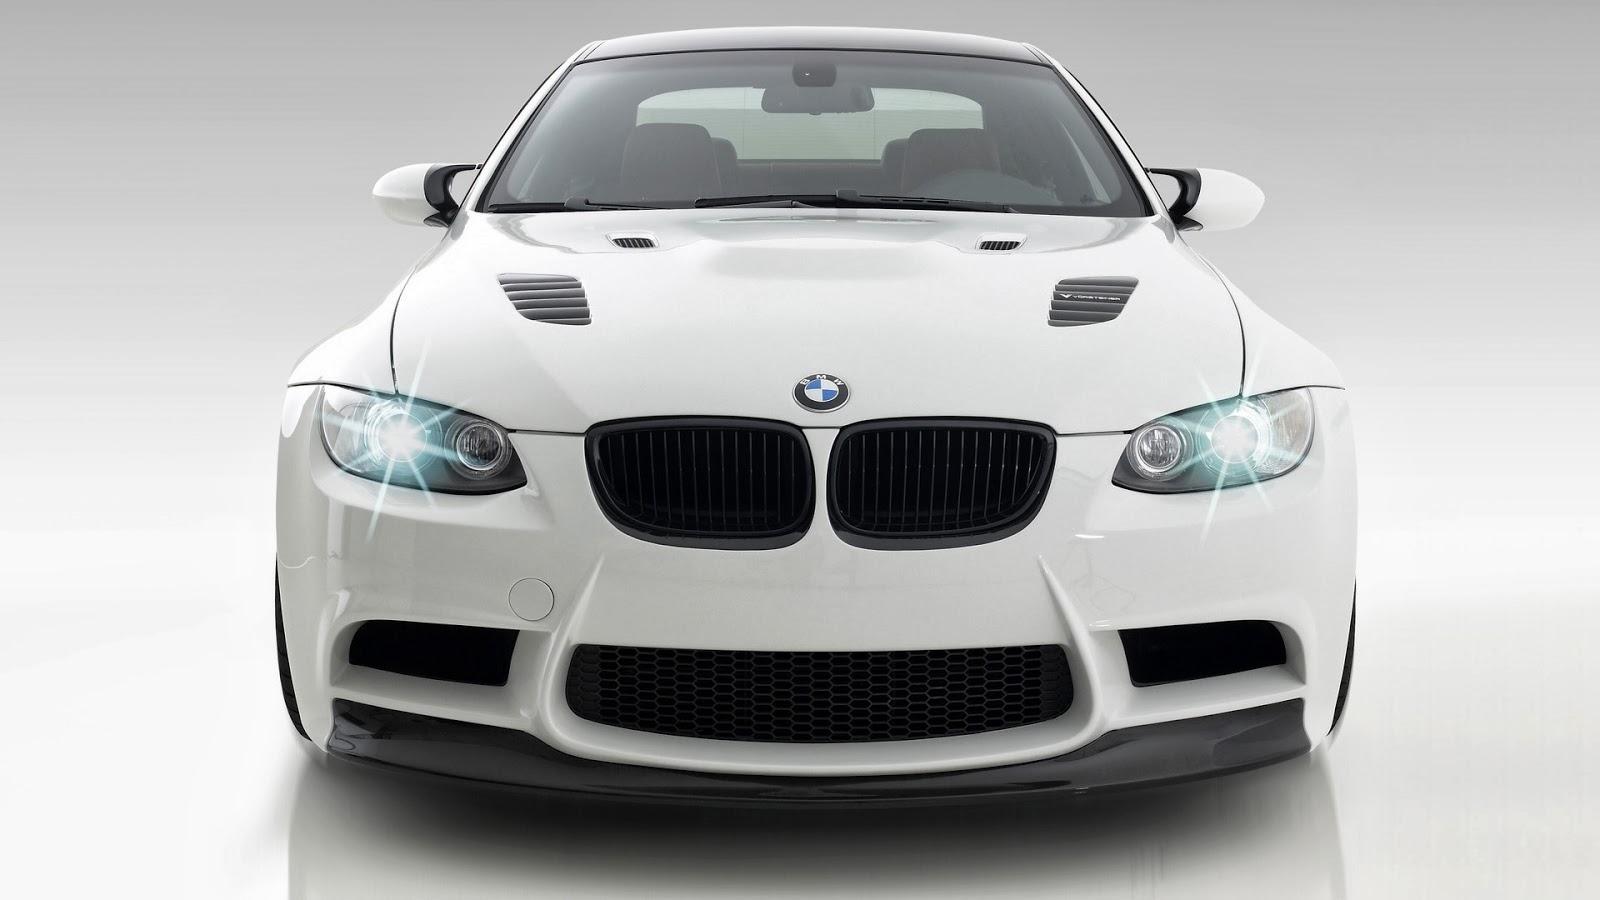 hd bmw car s 1080p